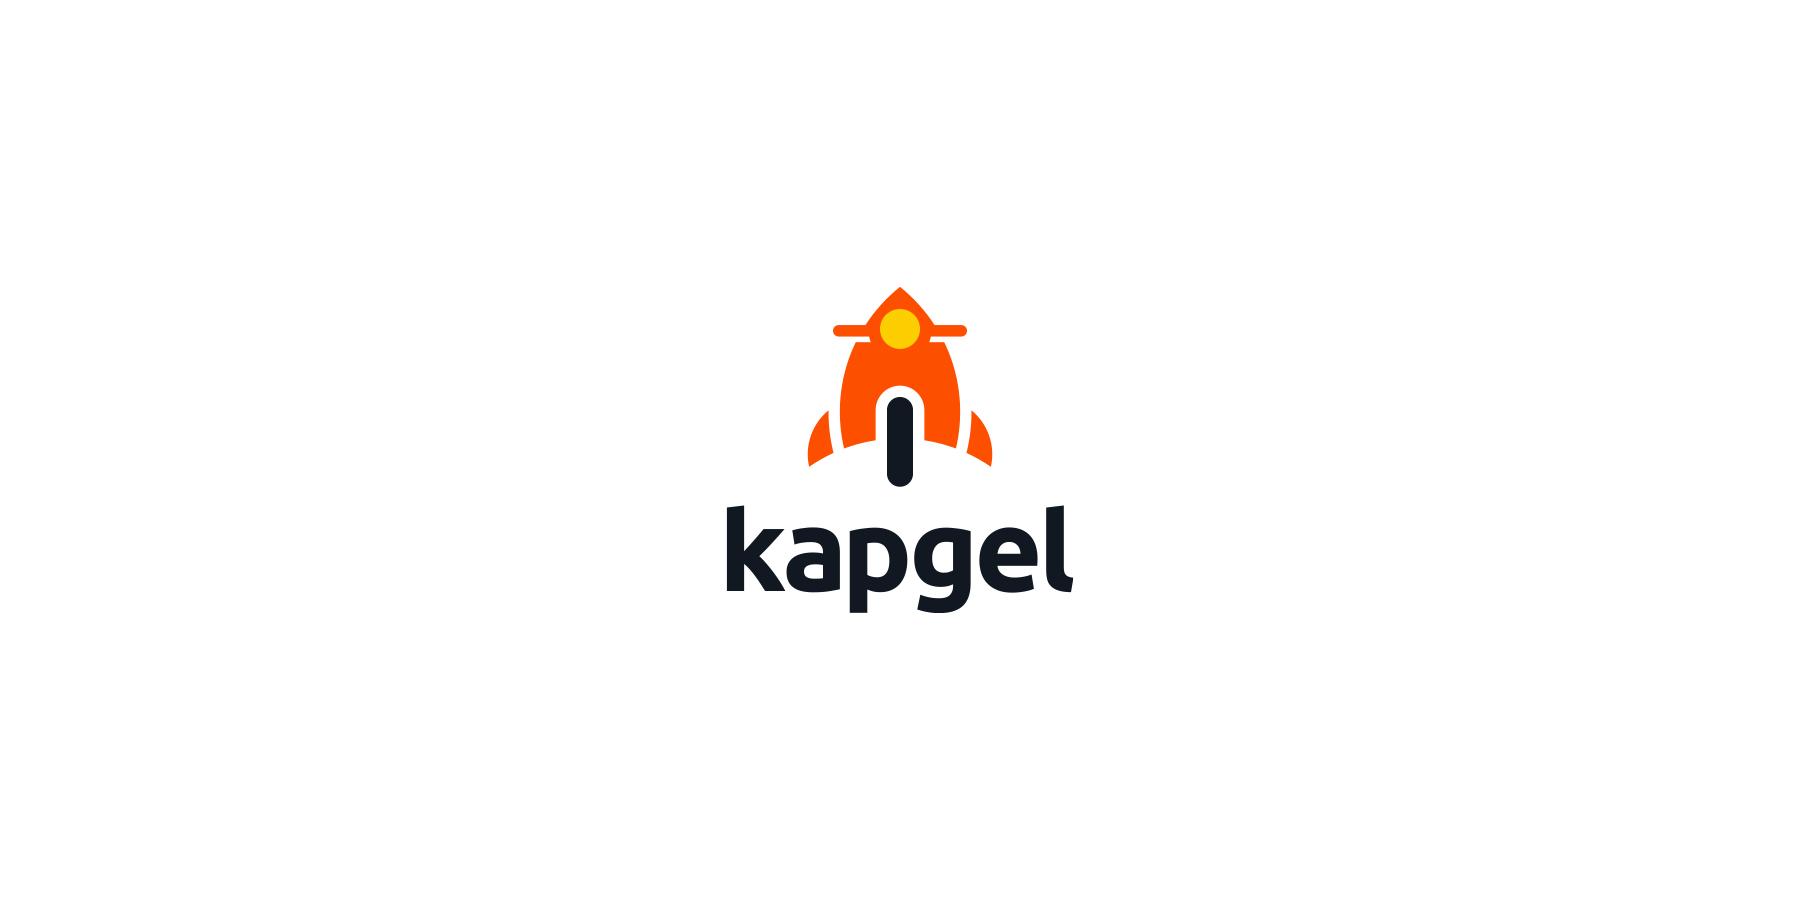 kapgel-logo-design-04